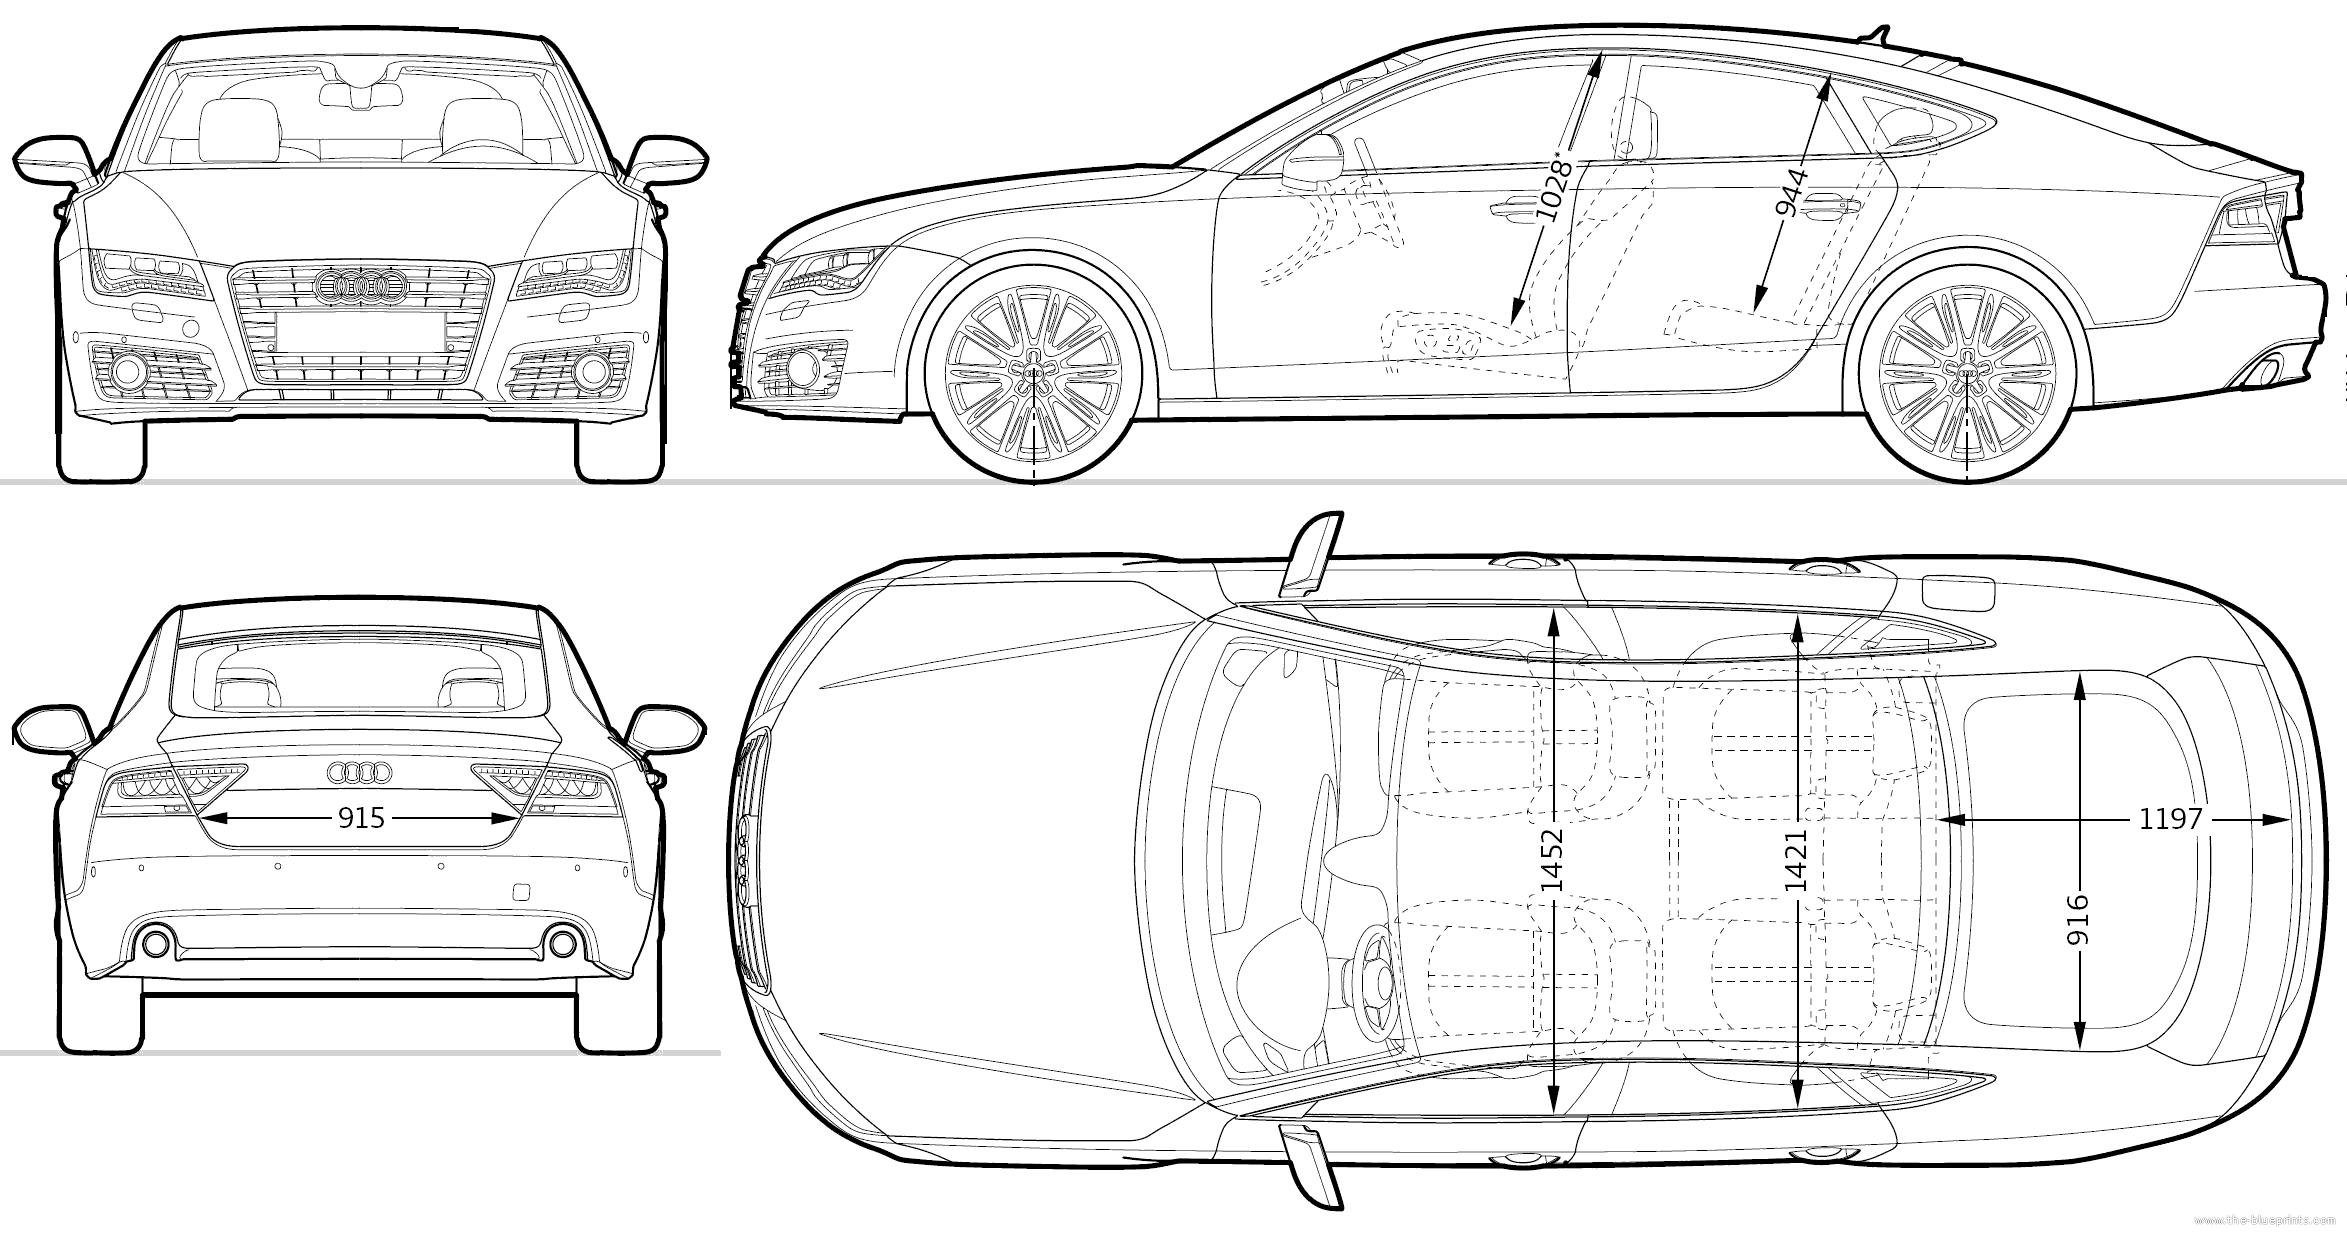 The-Blueprints.com - Blueprints > Cars > Audi > Audi A7 Sportback ...